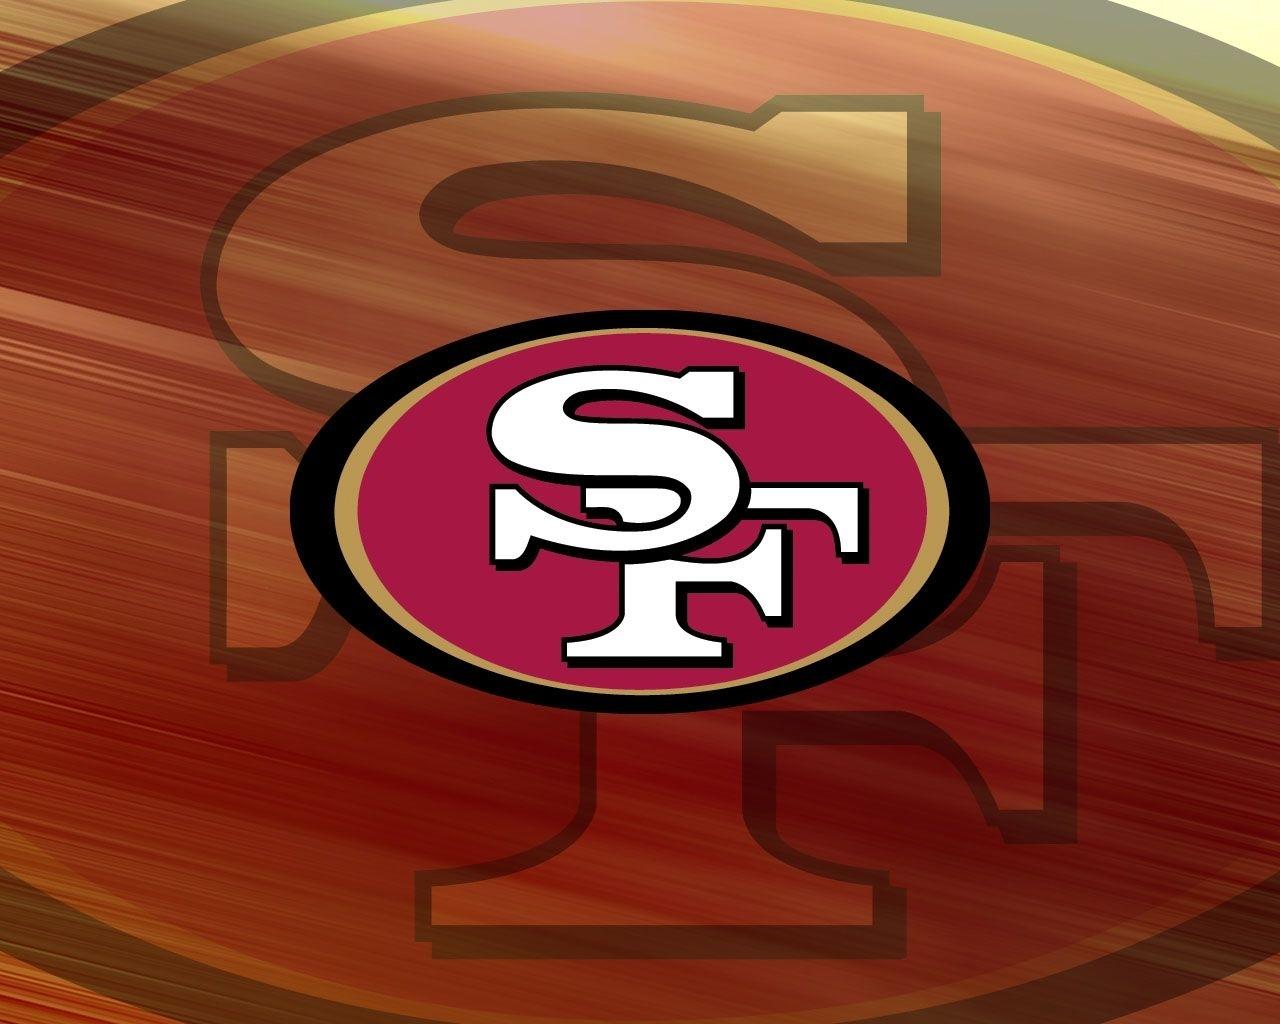 sf 49ers logo | san francisco 49ers team logo wallpaper 1280×1024